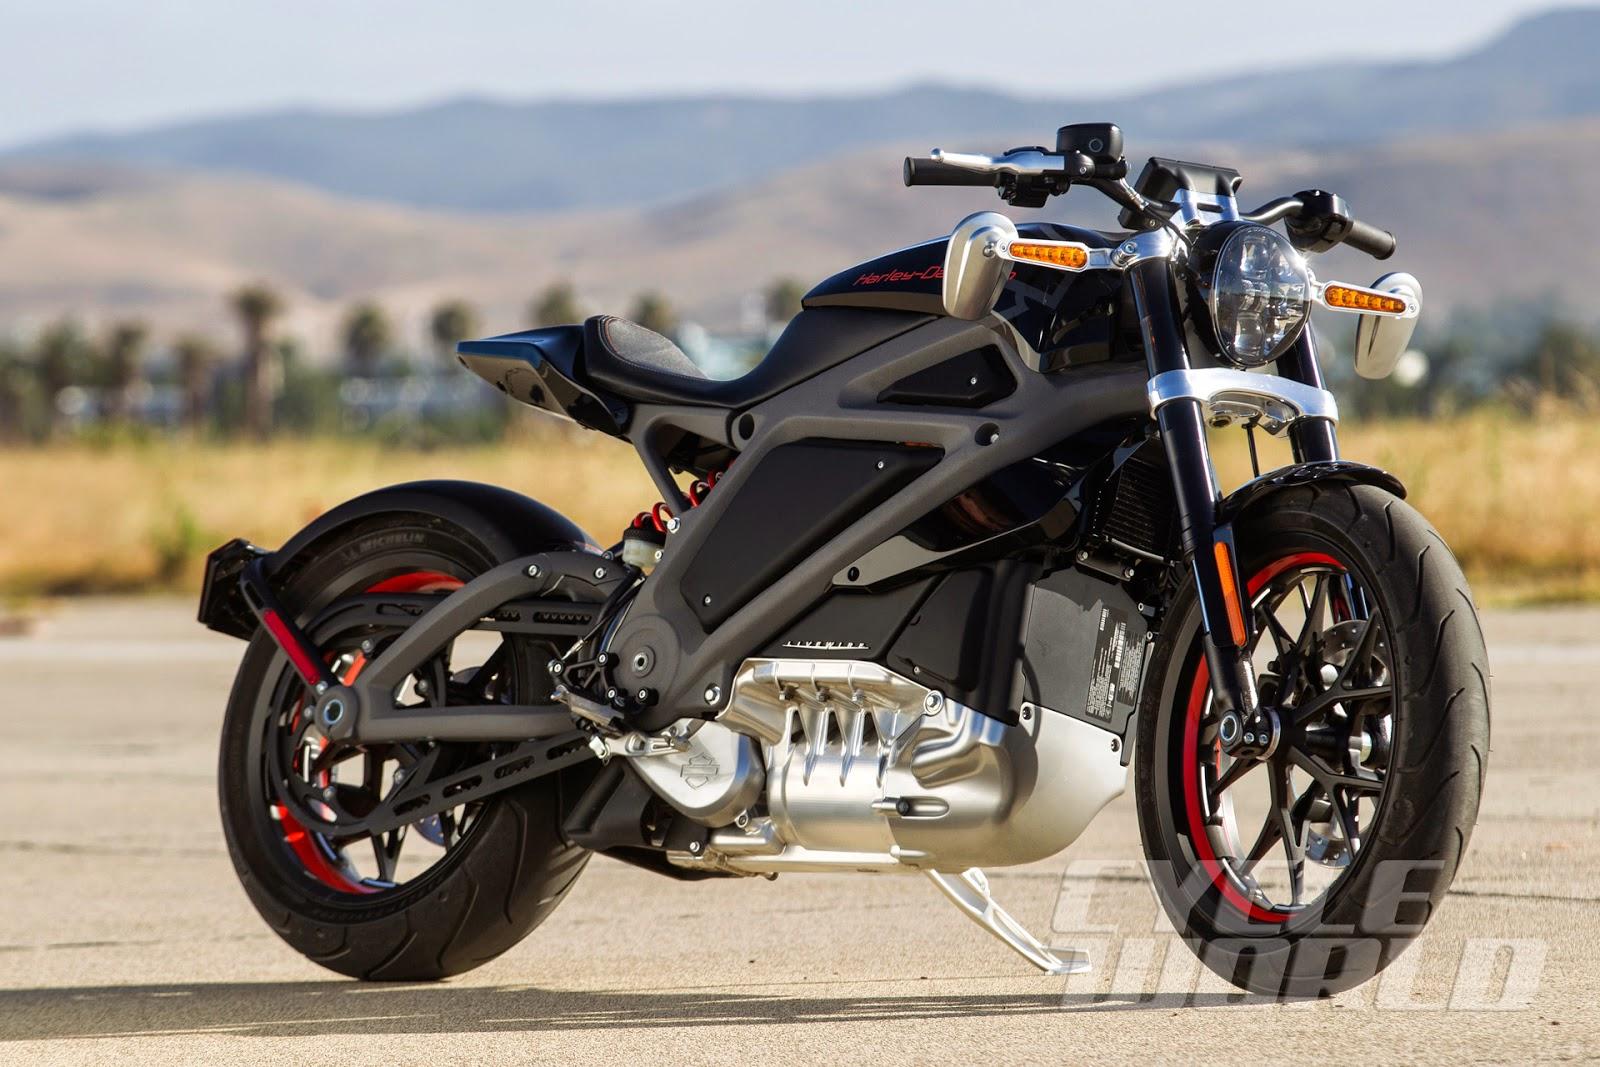 harley davidson livewire electric motorcycle first ride. Black Bedroom Furniture Sets. Home Design Ideas